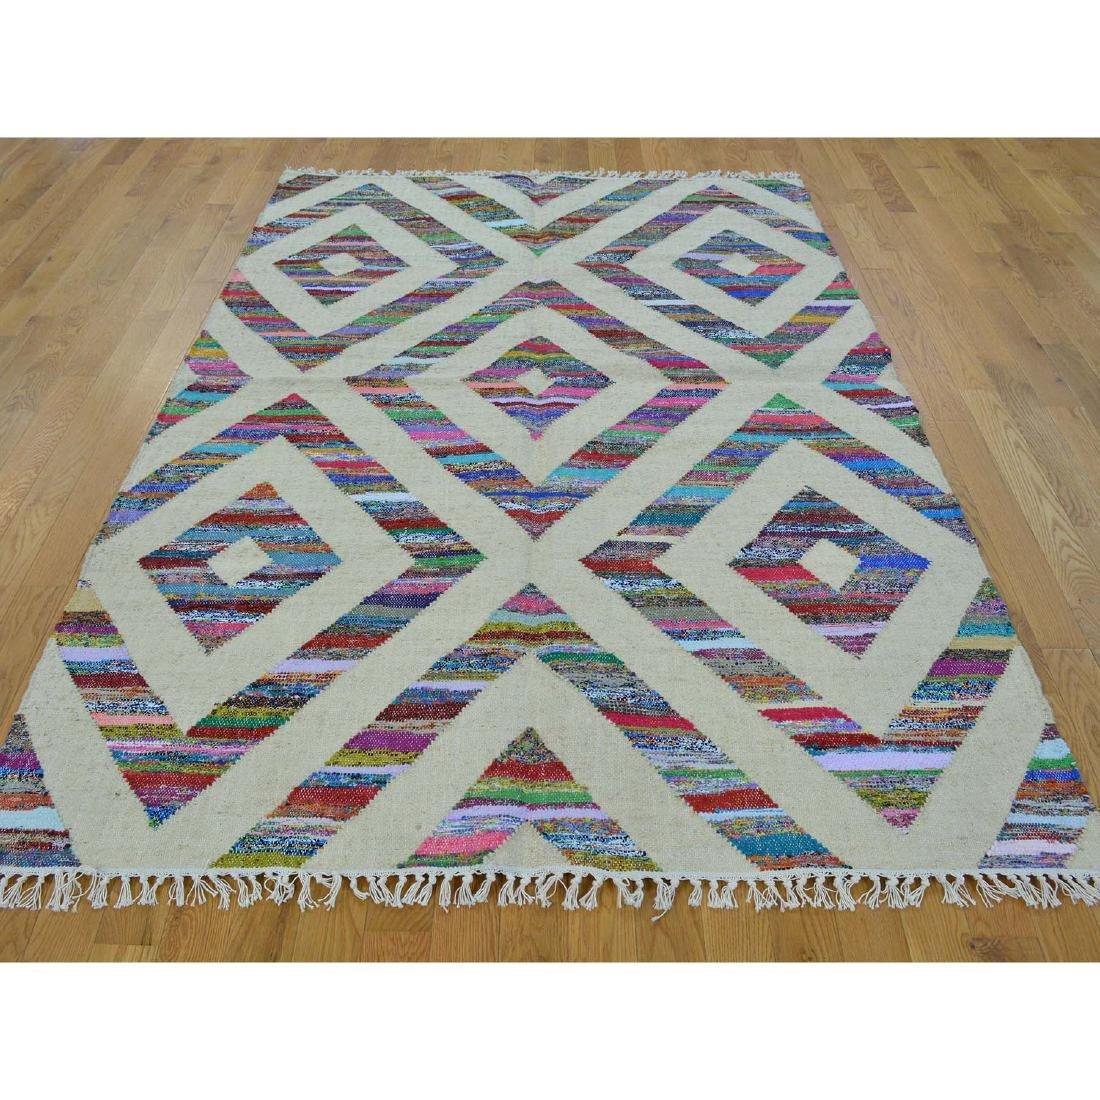 Durie Kilim Wool & Sari Silk Flat Weave Rug 5x7.2 - 2